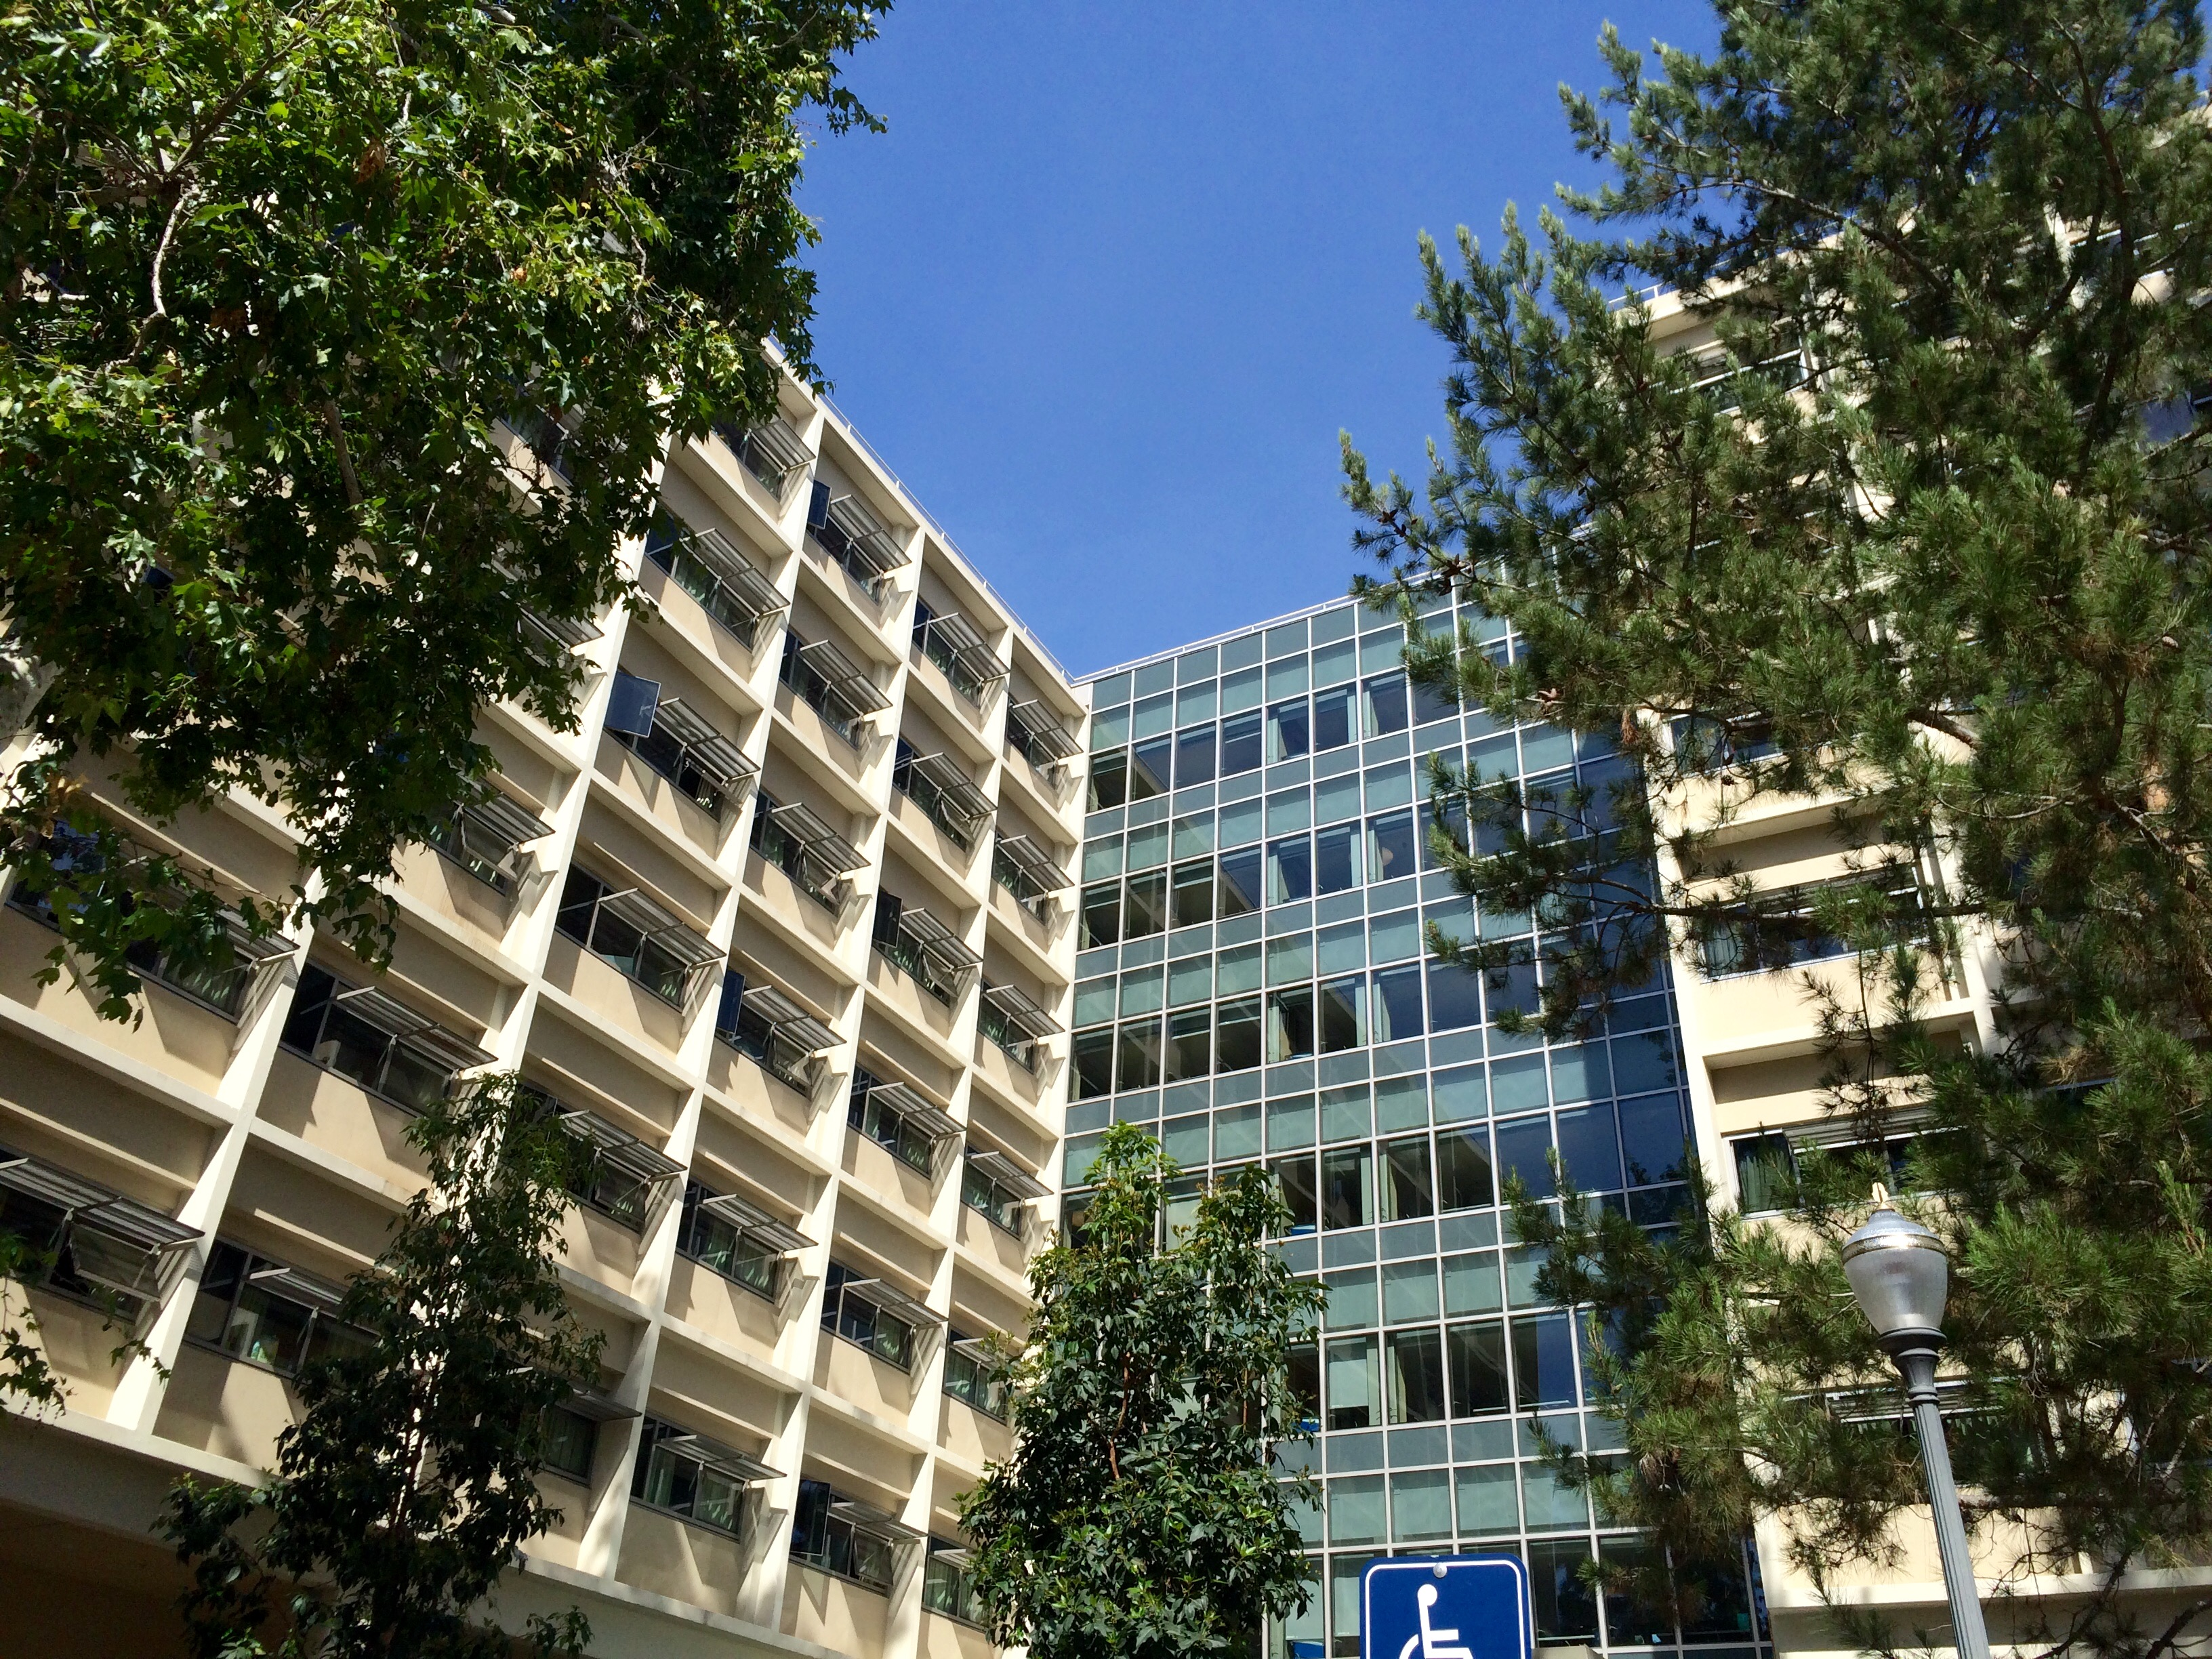 Ucla Dorm Buildings uc...